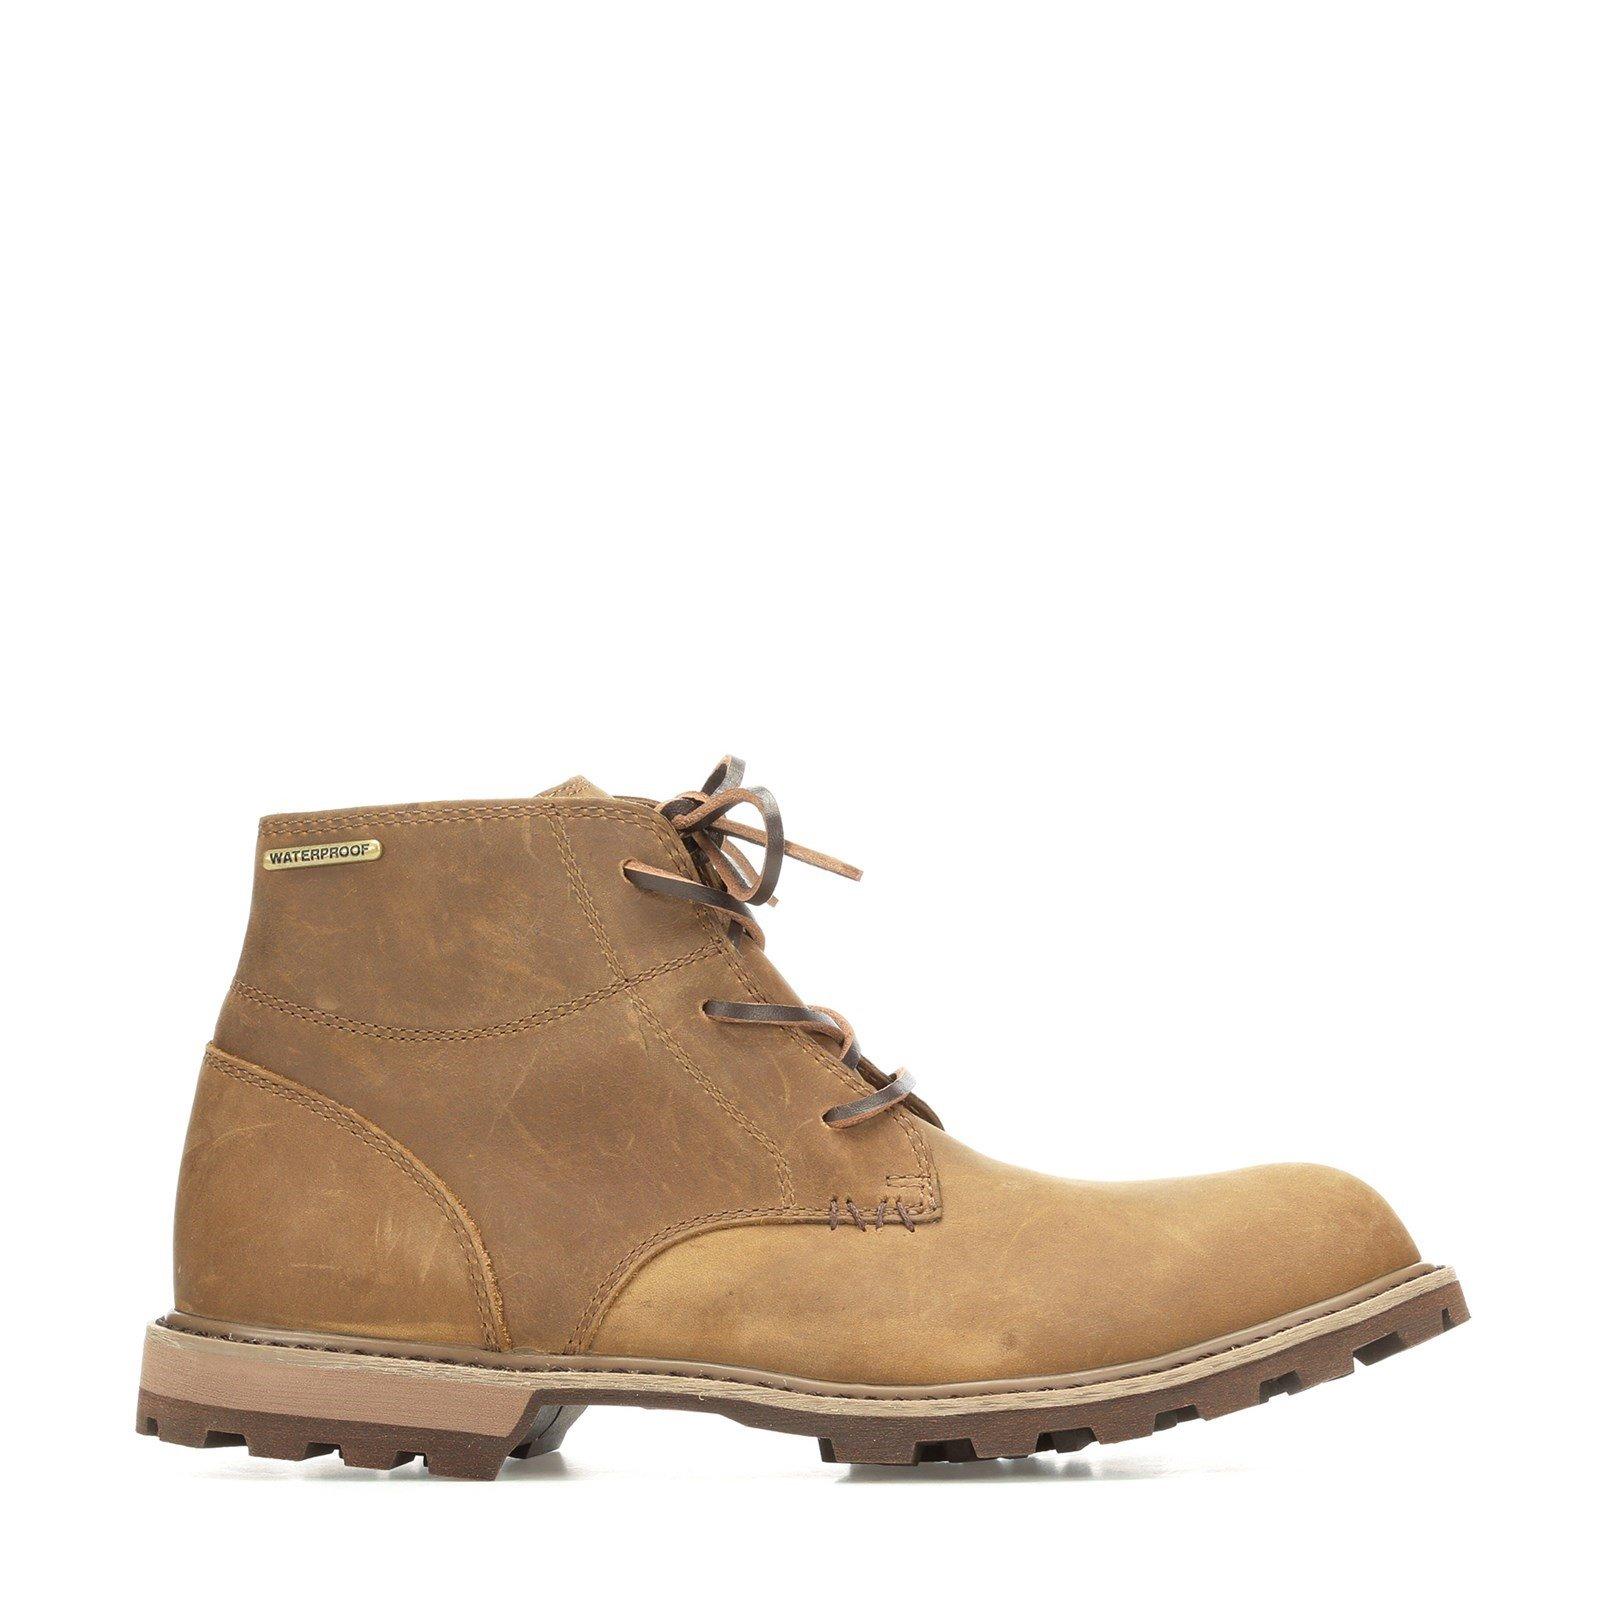 Muck Boots Men's Freeman Boot 31761 - Tan 6